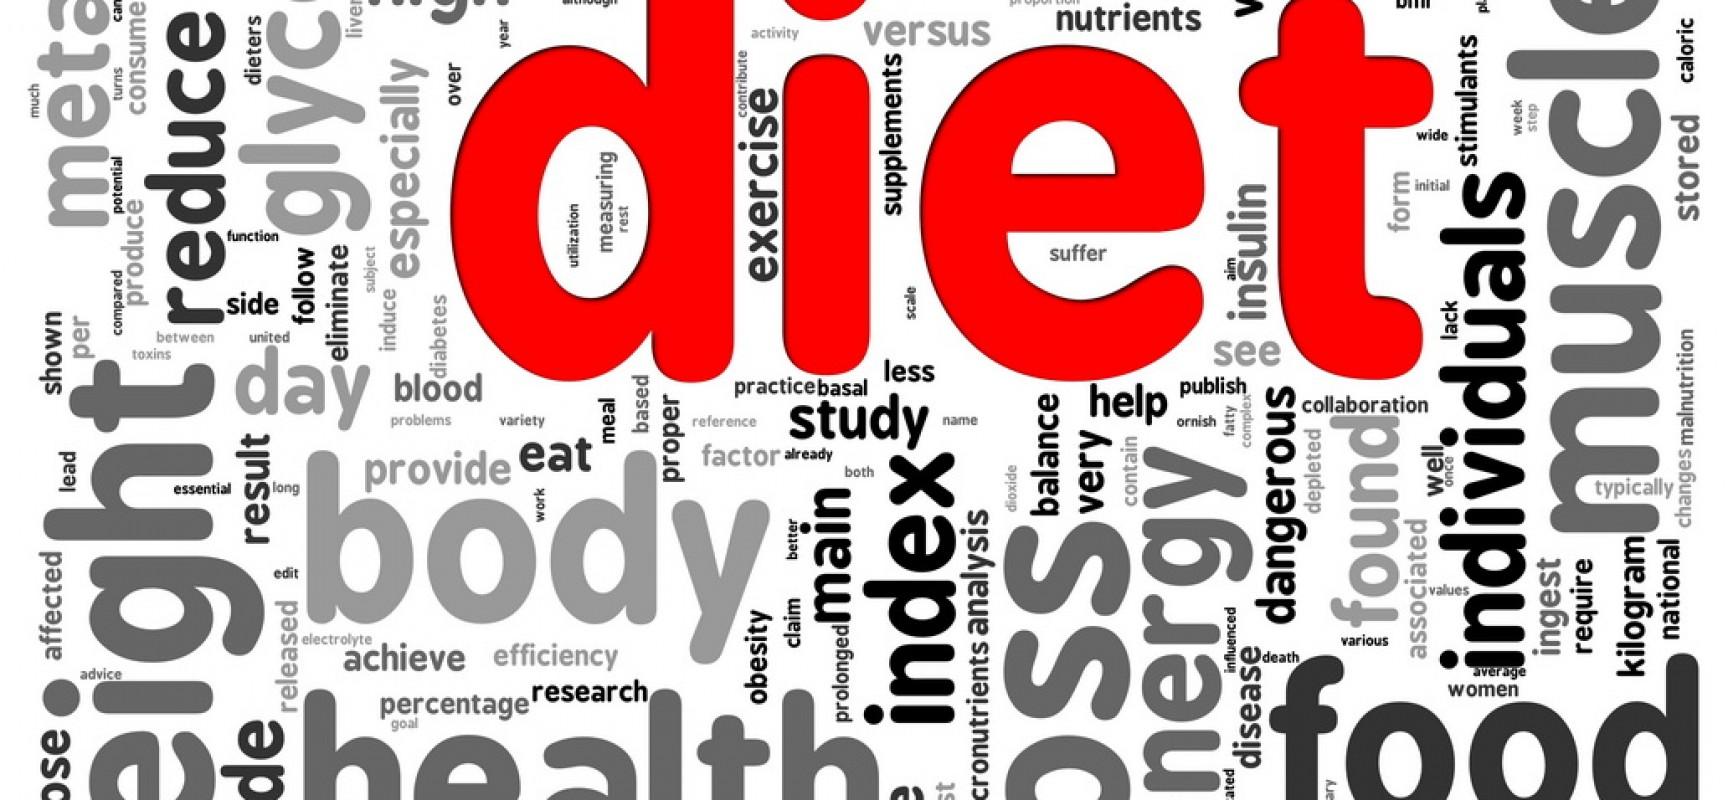 The alkaline diet for men